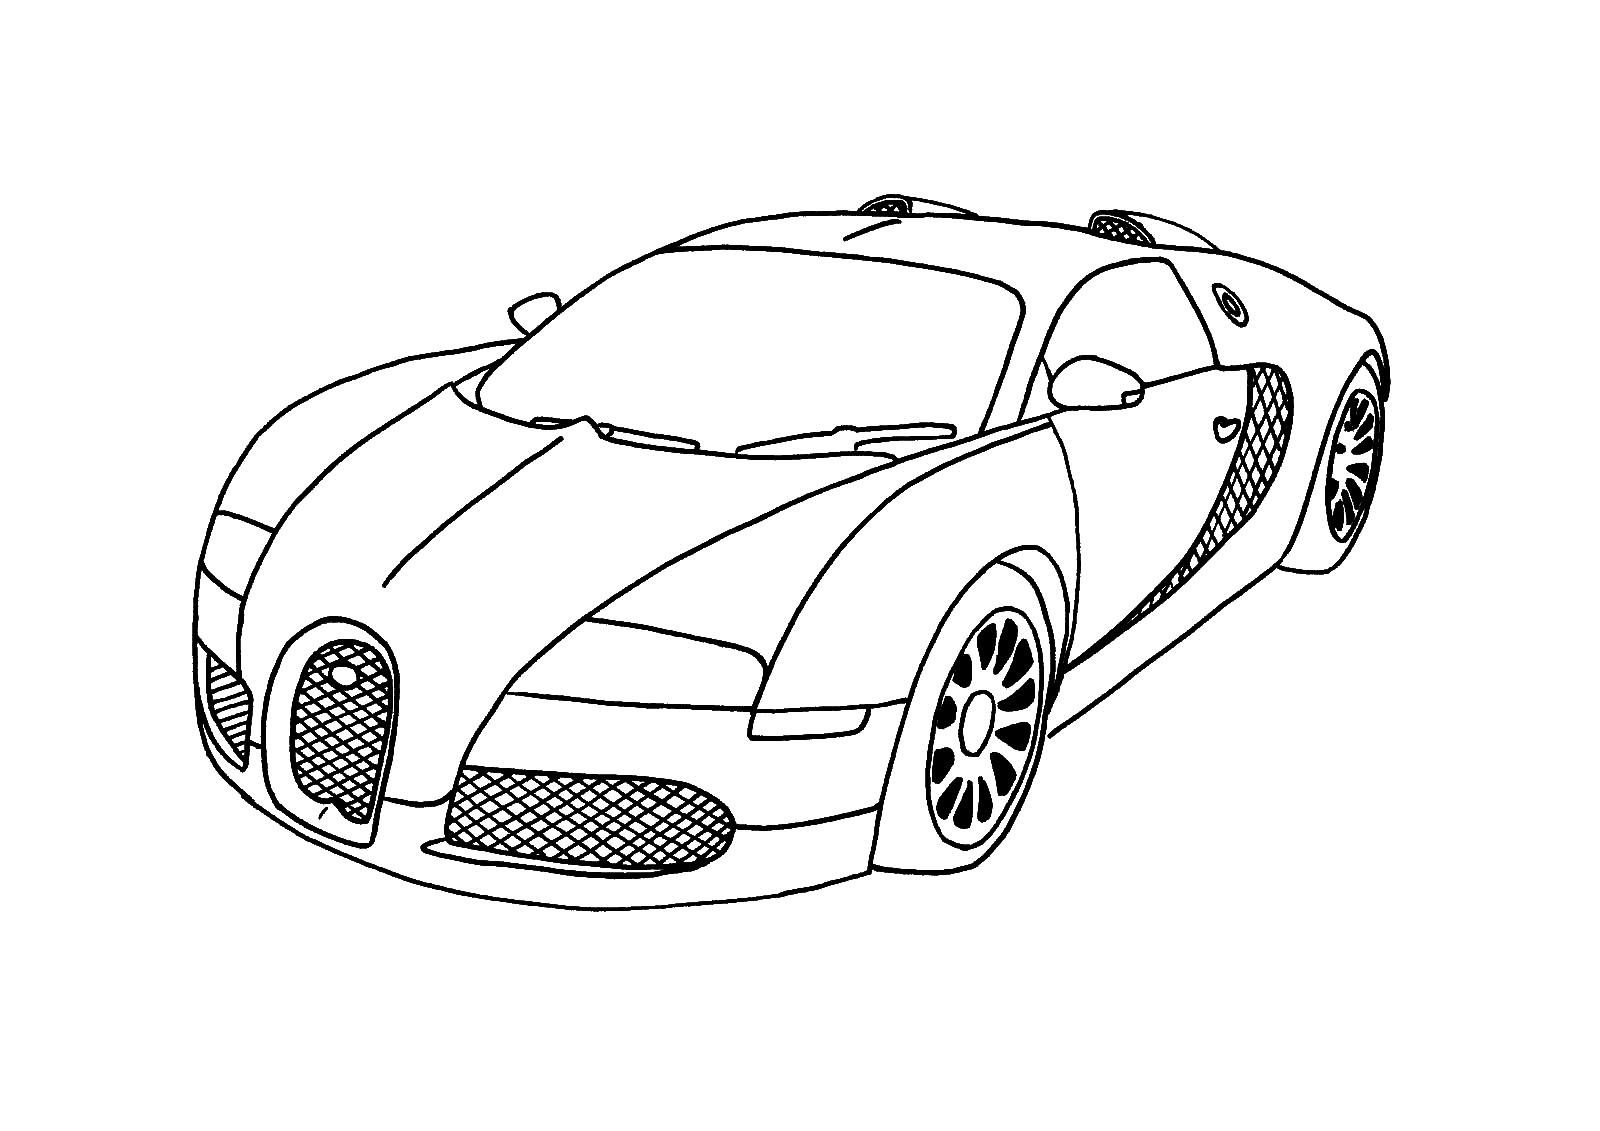 Imprimir gratis dibujos para colorear – automovil